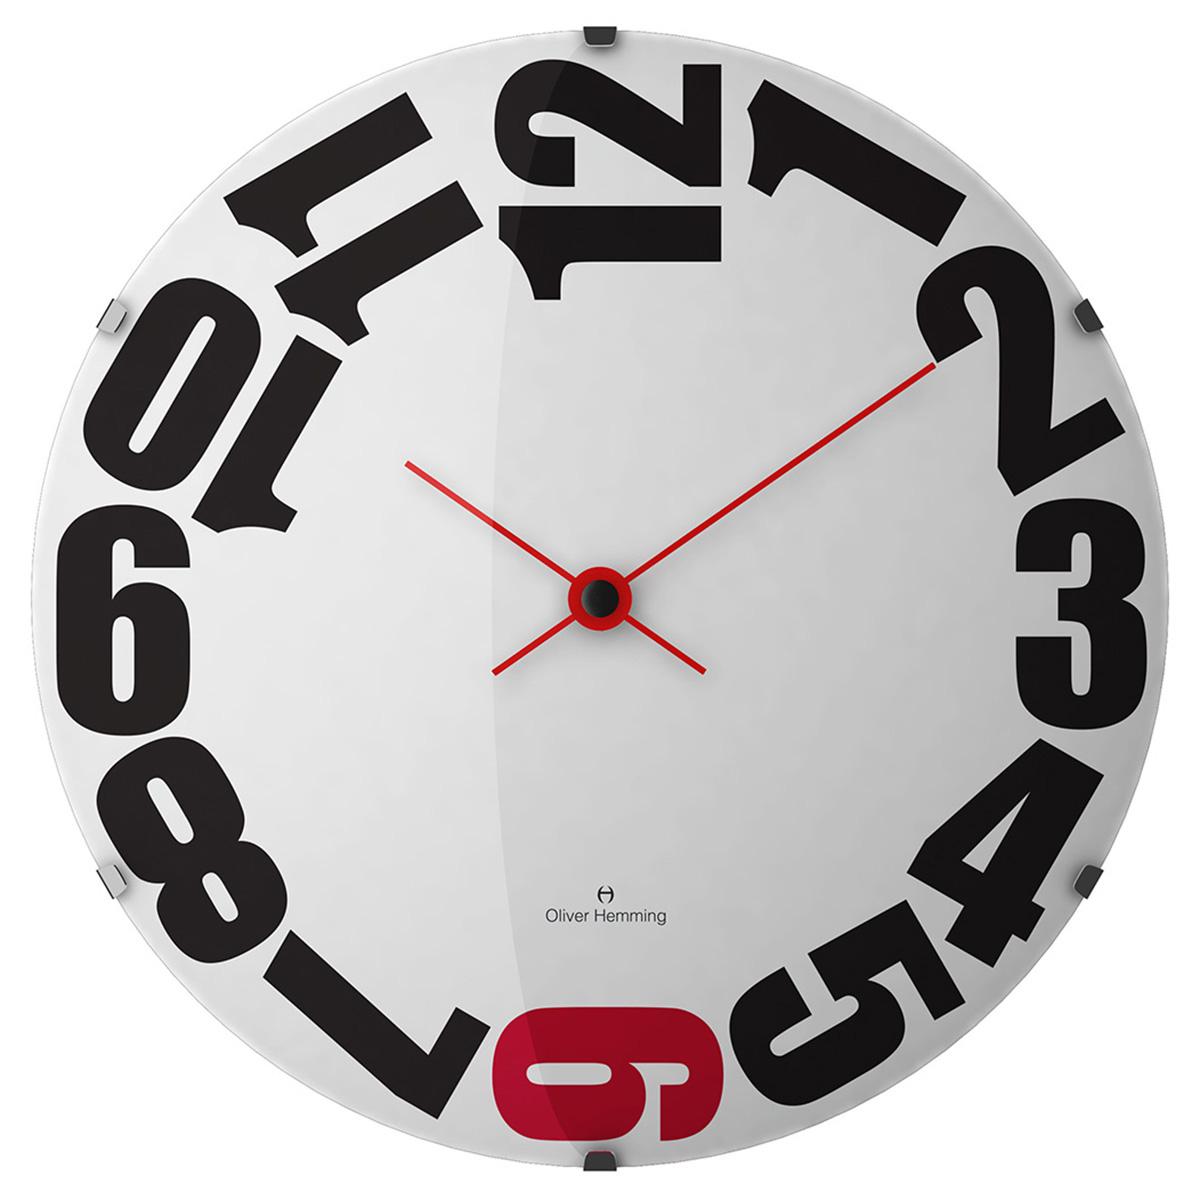 Oliver Hemming オリバーヘミング 壁掛け時計 インテリア 北欧 Vitri Domed Glass ヴィトリドームガラス 370mm [W370DG20WR] 正規品